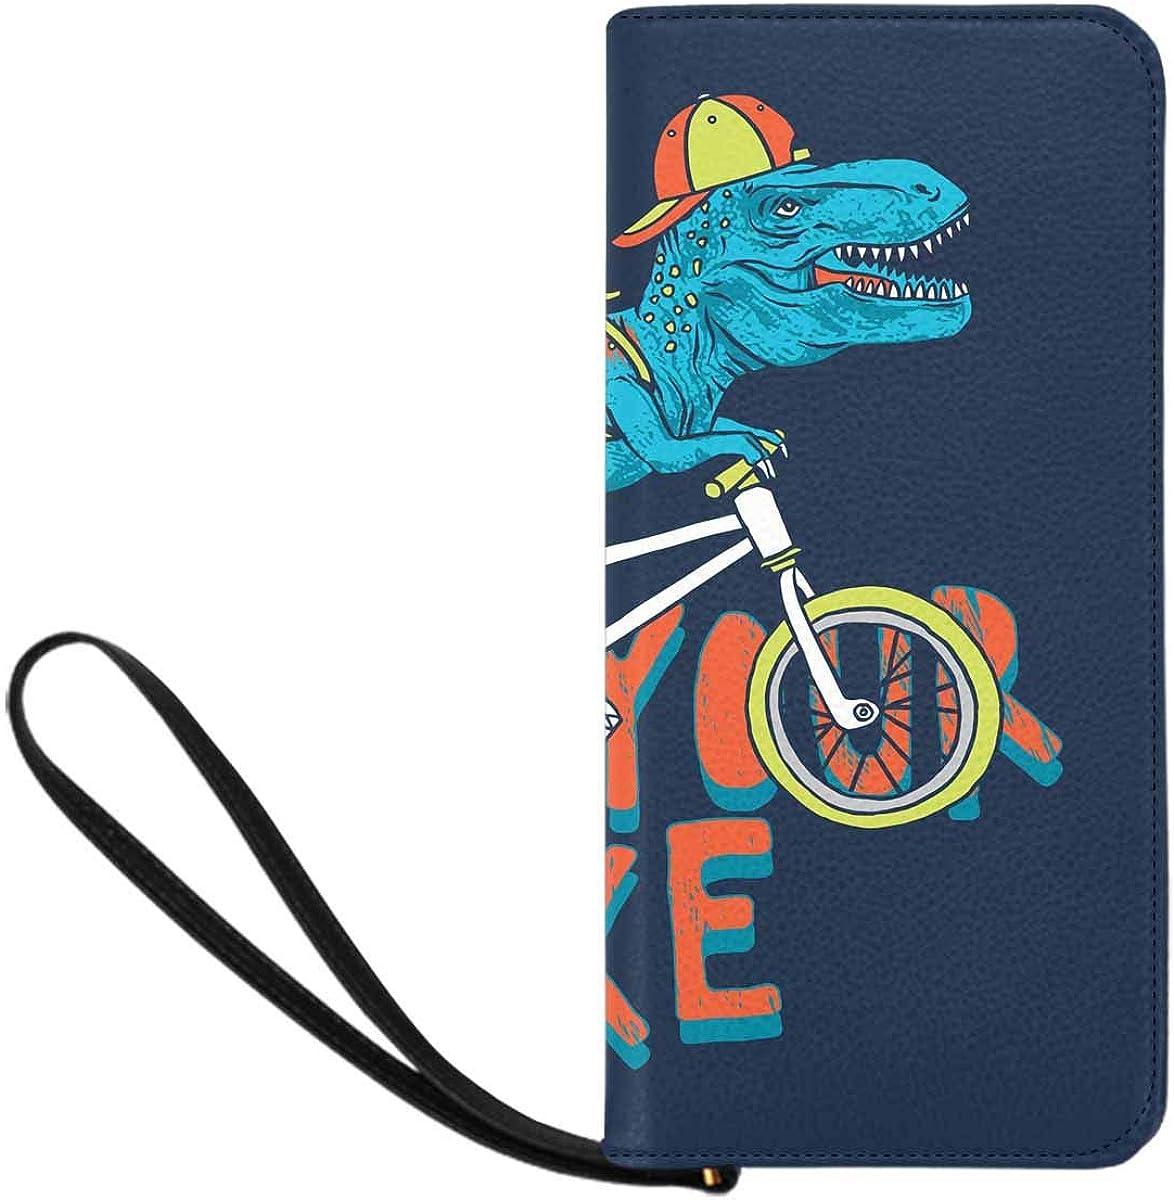 INTERESTPRINT Dinosaur and Bike Print Wristlet Wallet for Women with Wrist Strap